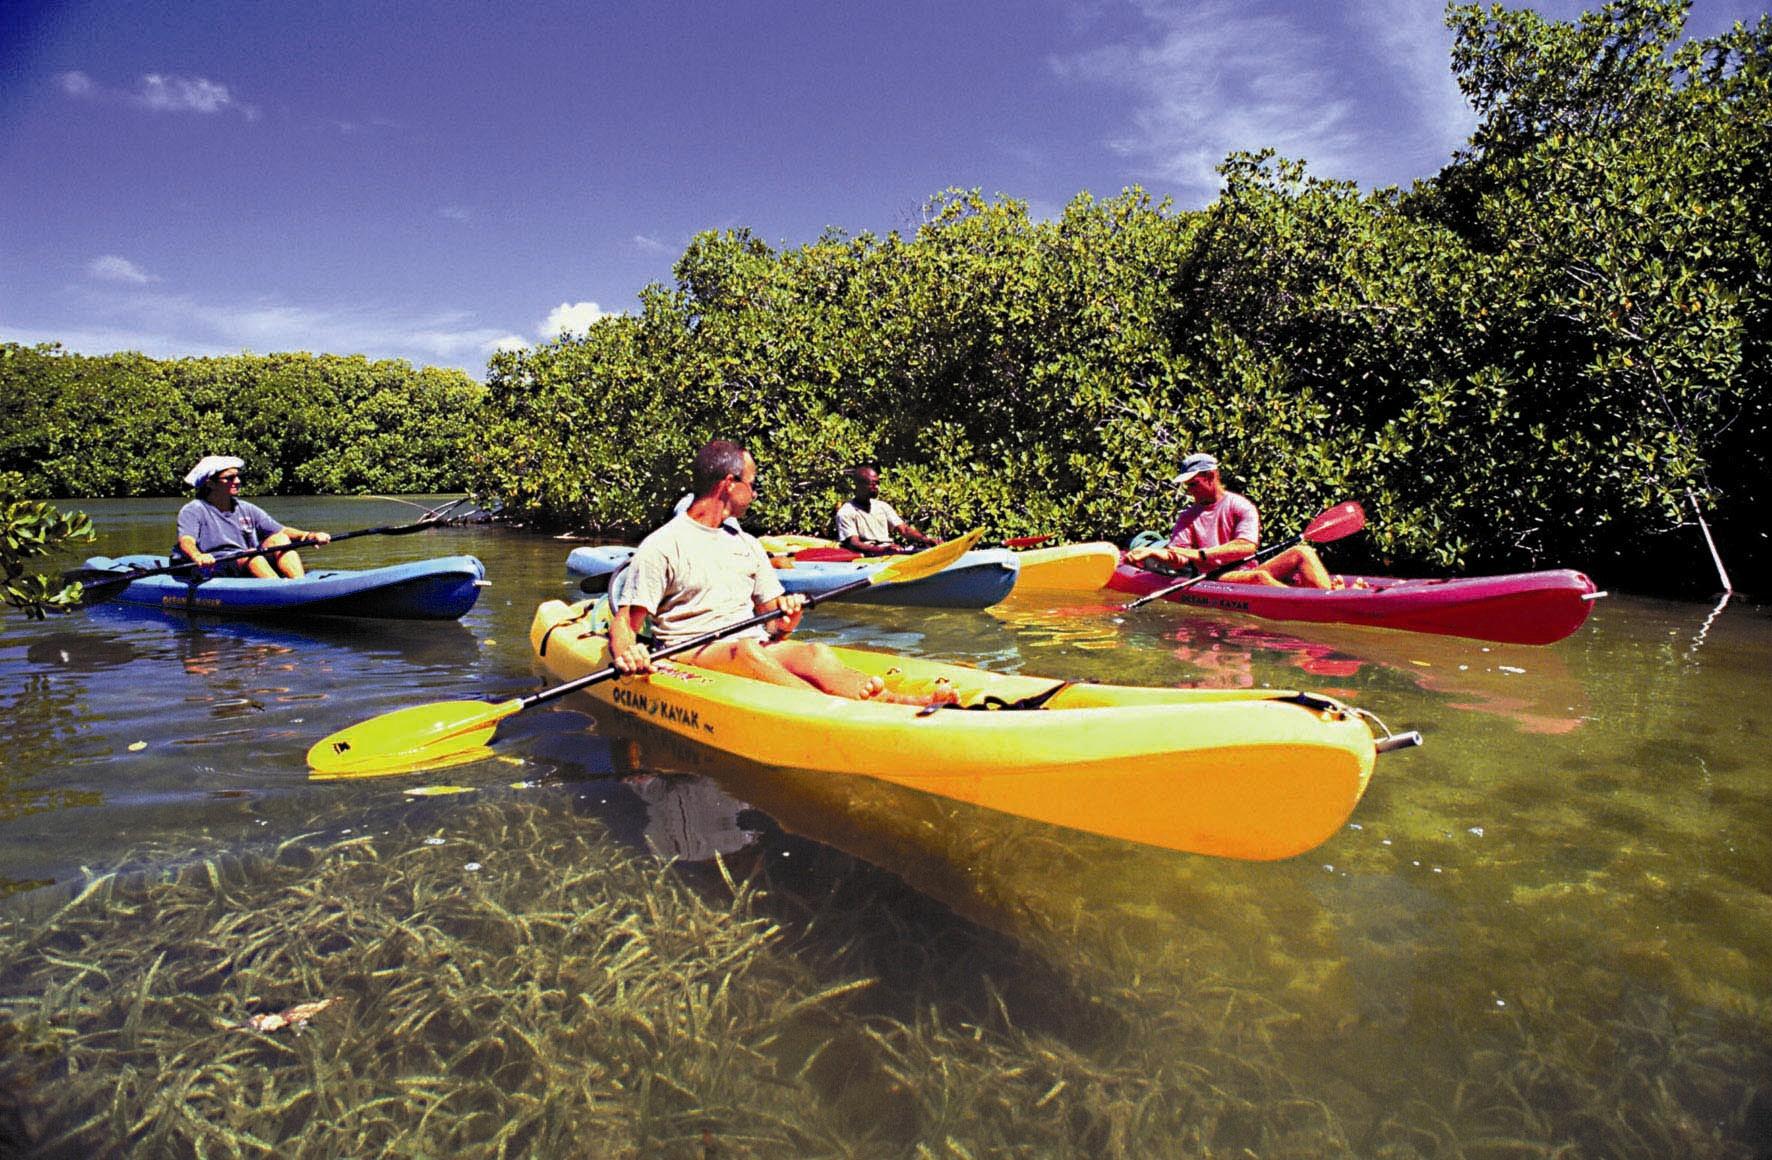 Kayaking through the mangroves, Bonaire